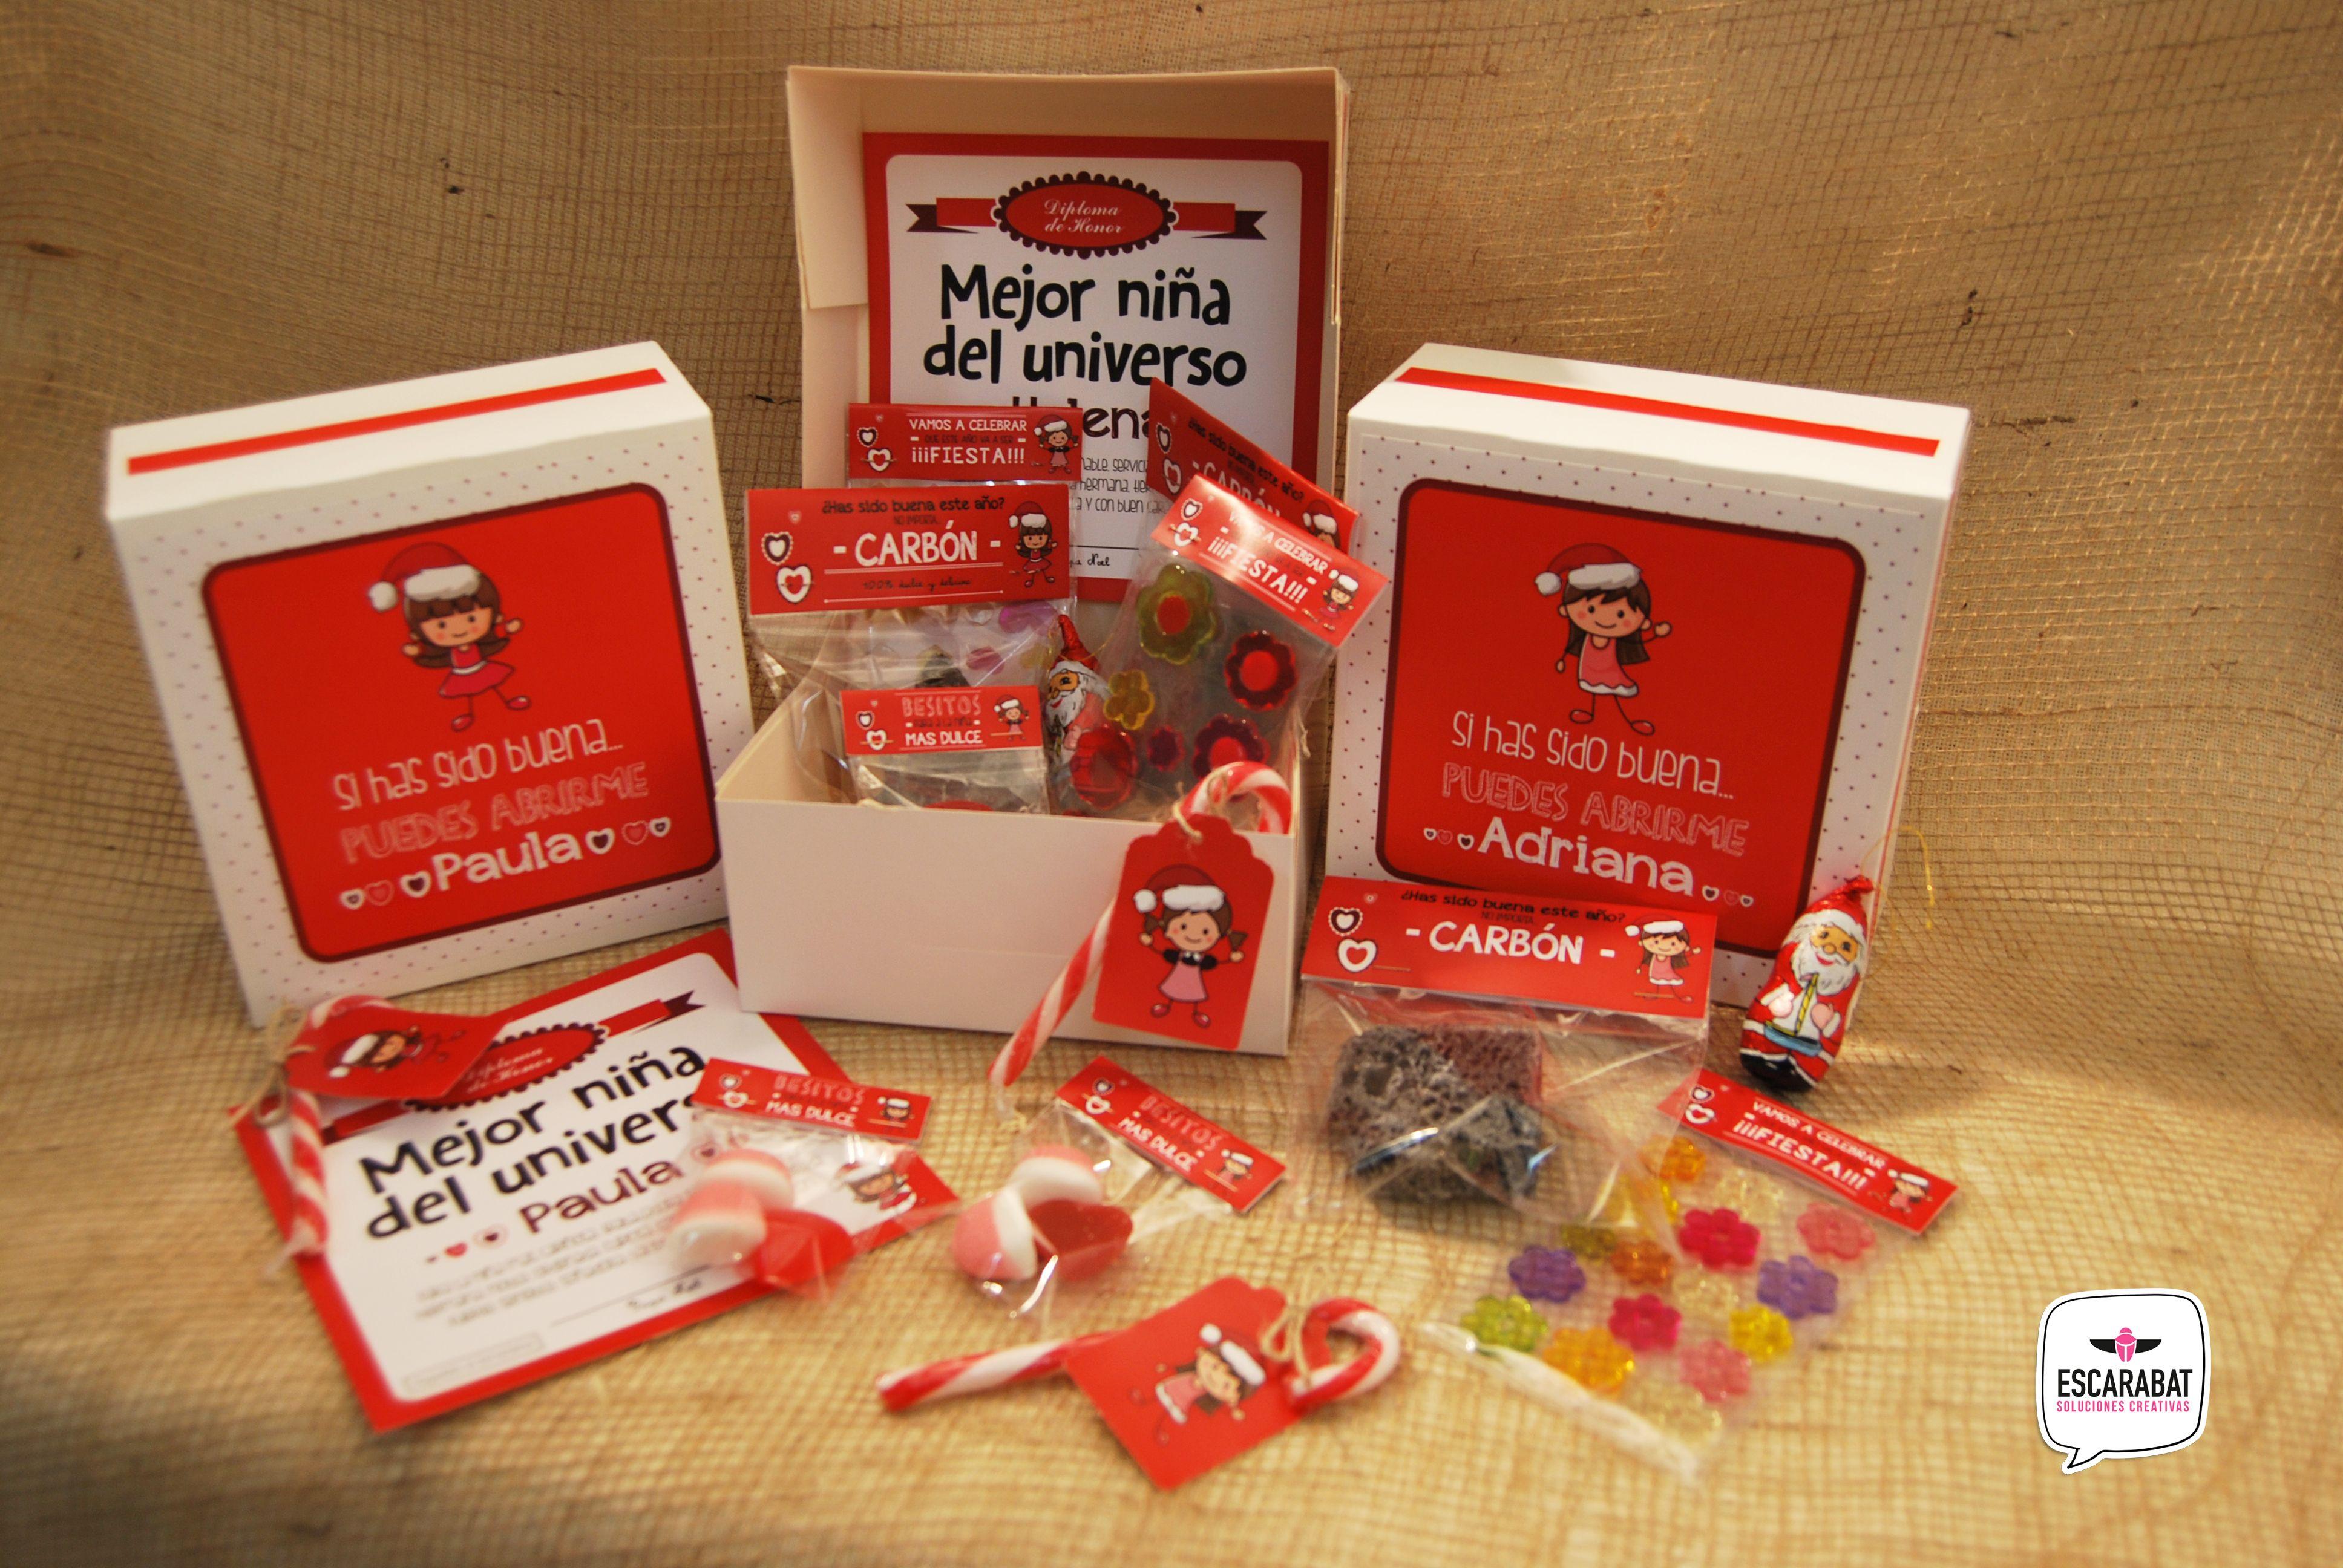 Pack Navideno Personalizado Con Diferentes Dulces Y Detalles Escarabat Packpersonalizado Packnavidad Packsgnadia Takeout Container Cafe Container